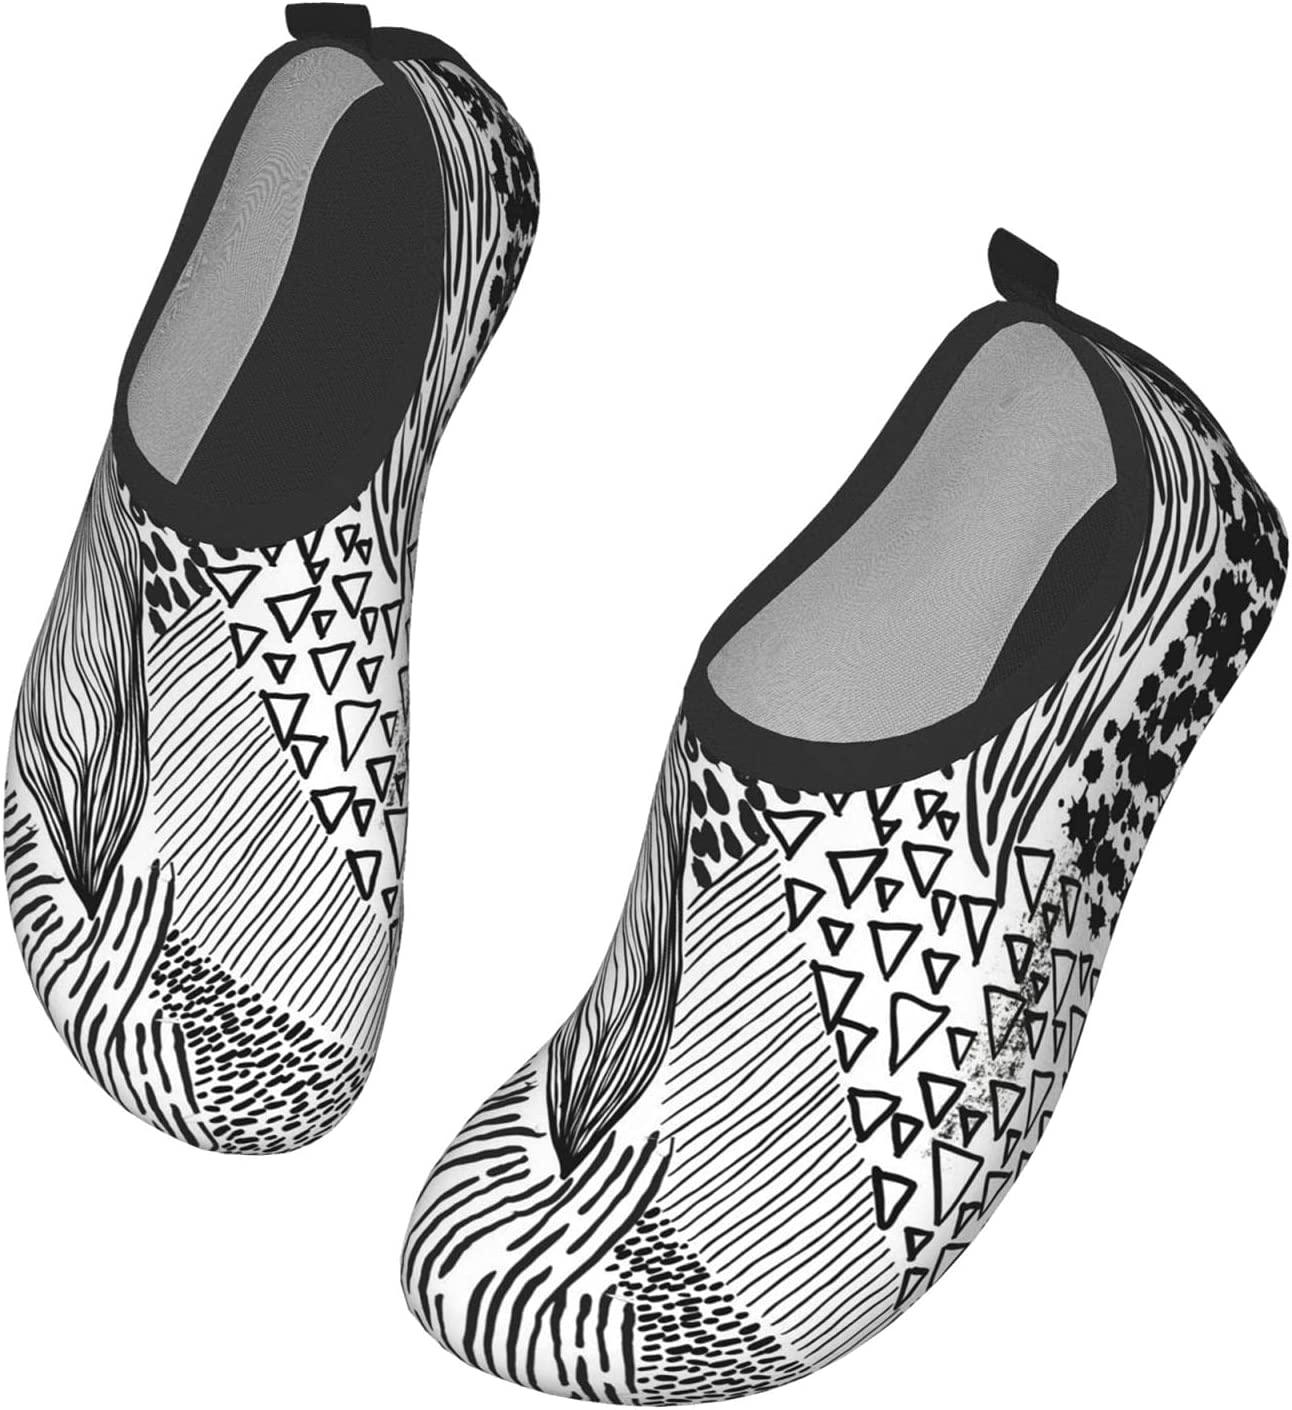 NA Black and White Scribble Men's Women's Water Shoes Barefoot Quick Dry Slip-On Aqua Socks for Yoga Beach Sports Swim Surf